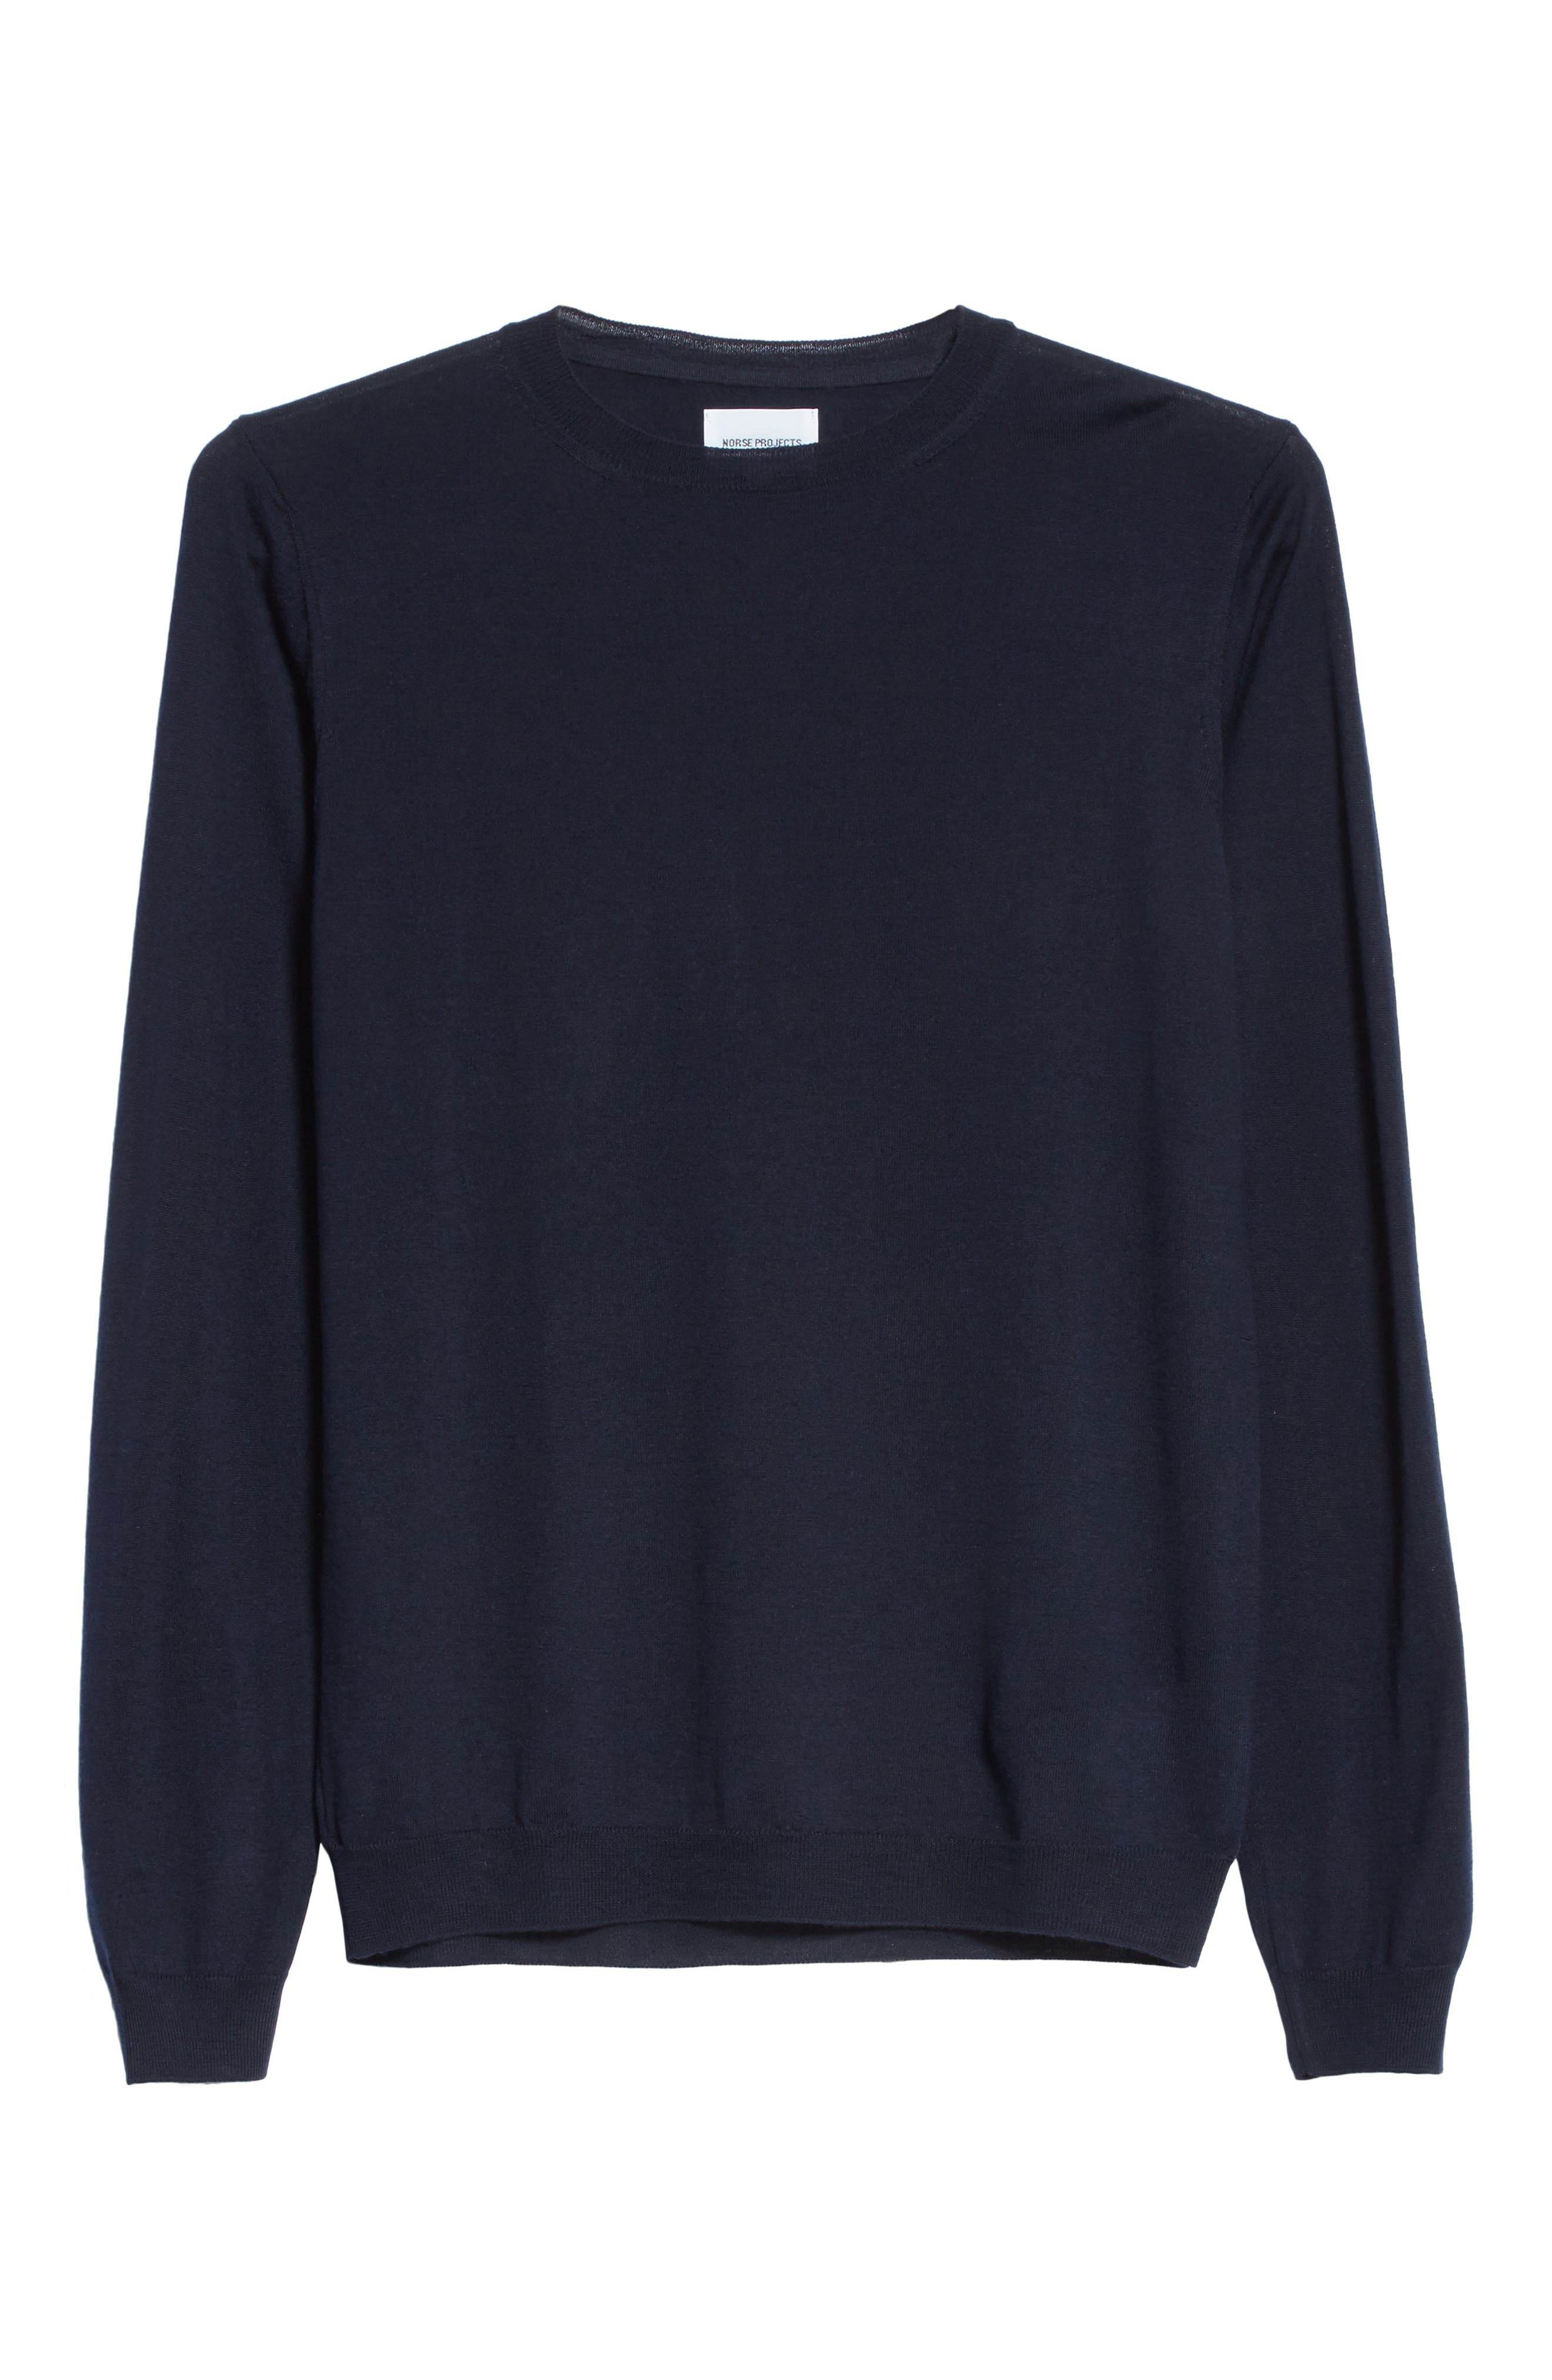 Sigfred Merino Wool & Silk Crewneck Sweater,                             Alternate thumbnail 6, color,                             Dark Navy